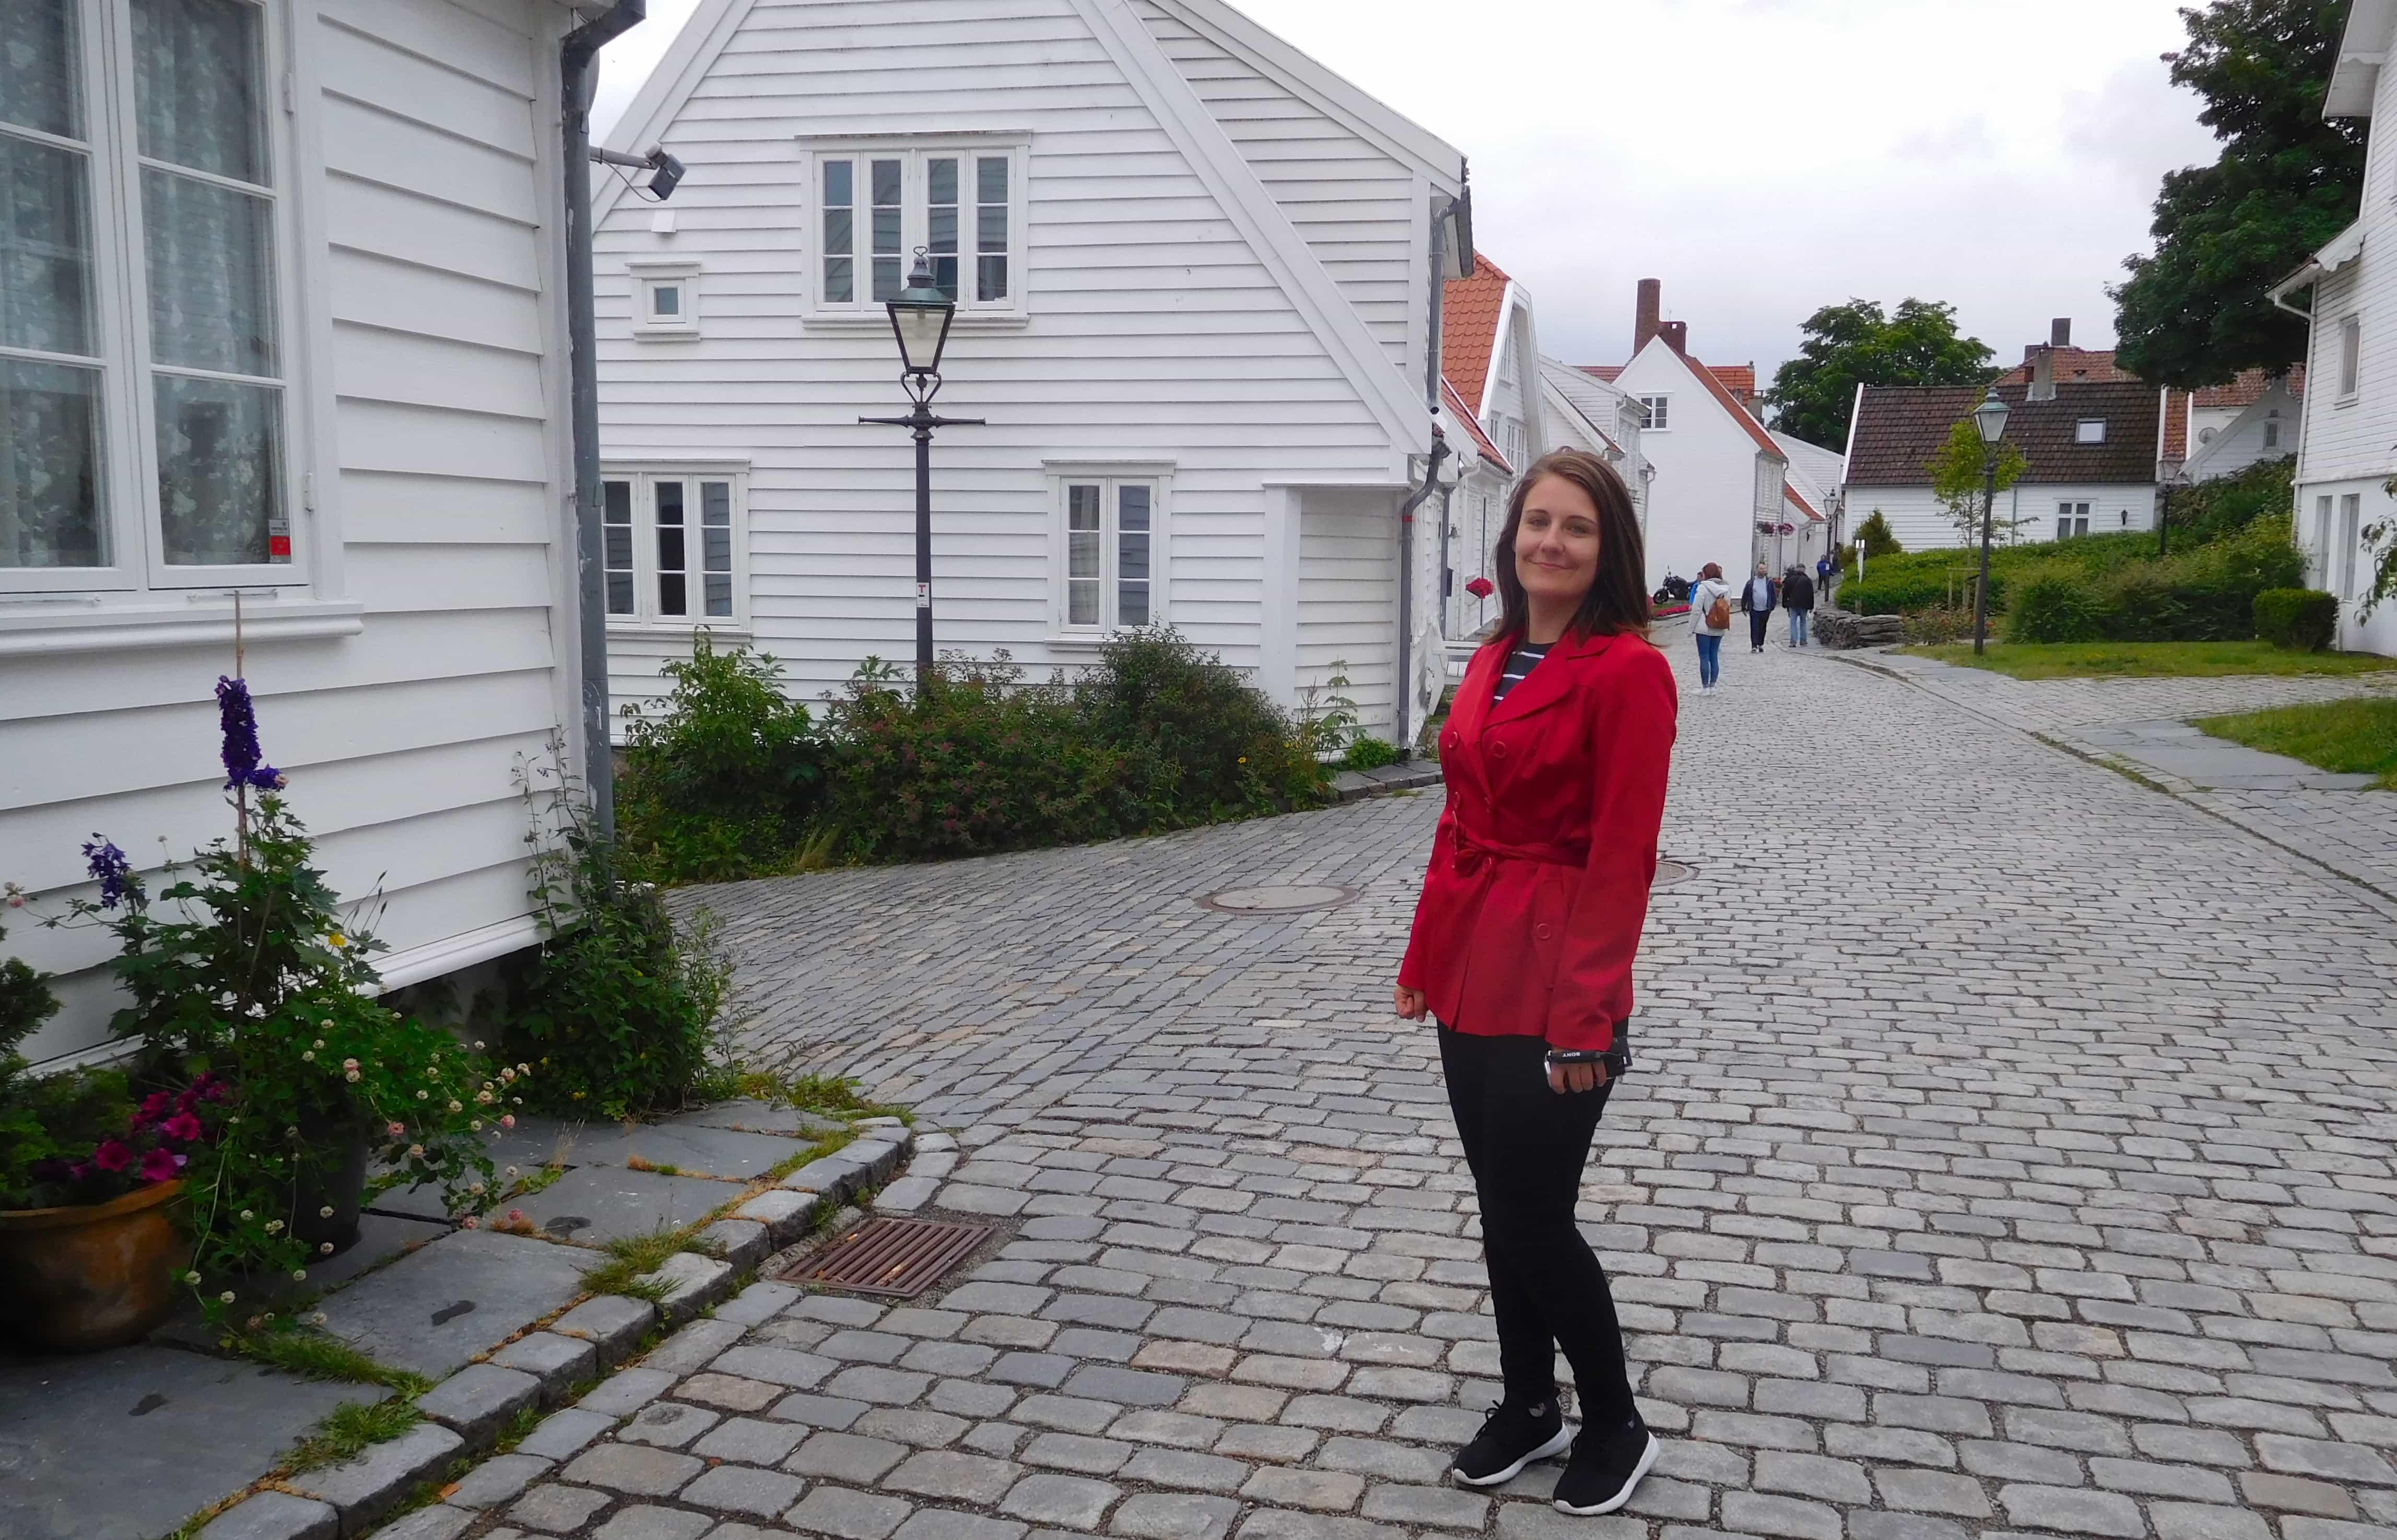 norwegian fjords stavanger cruise port norway old town